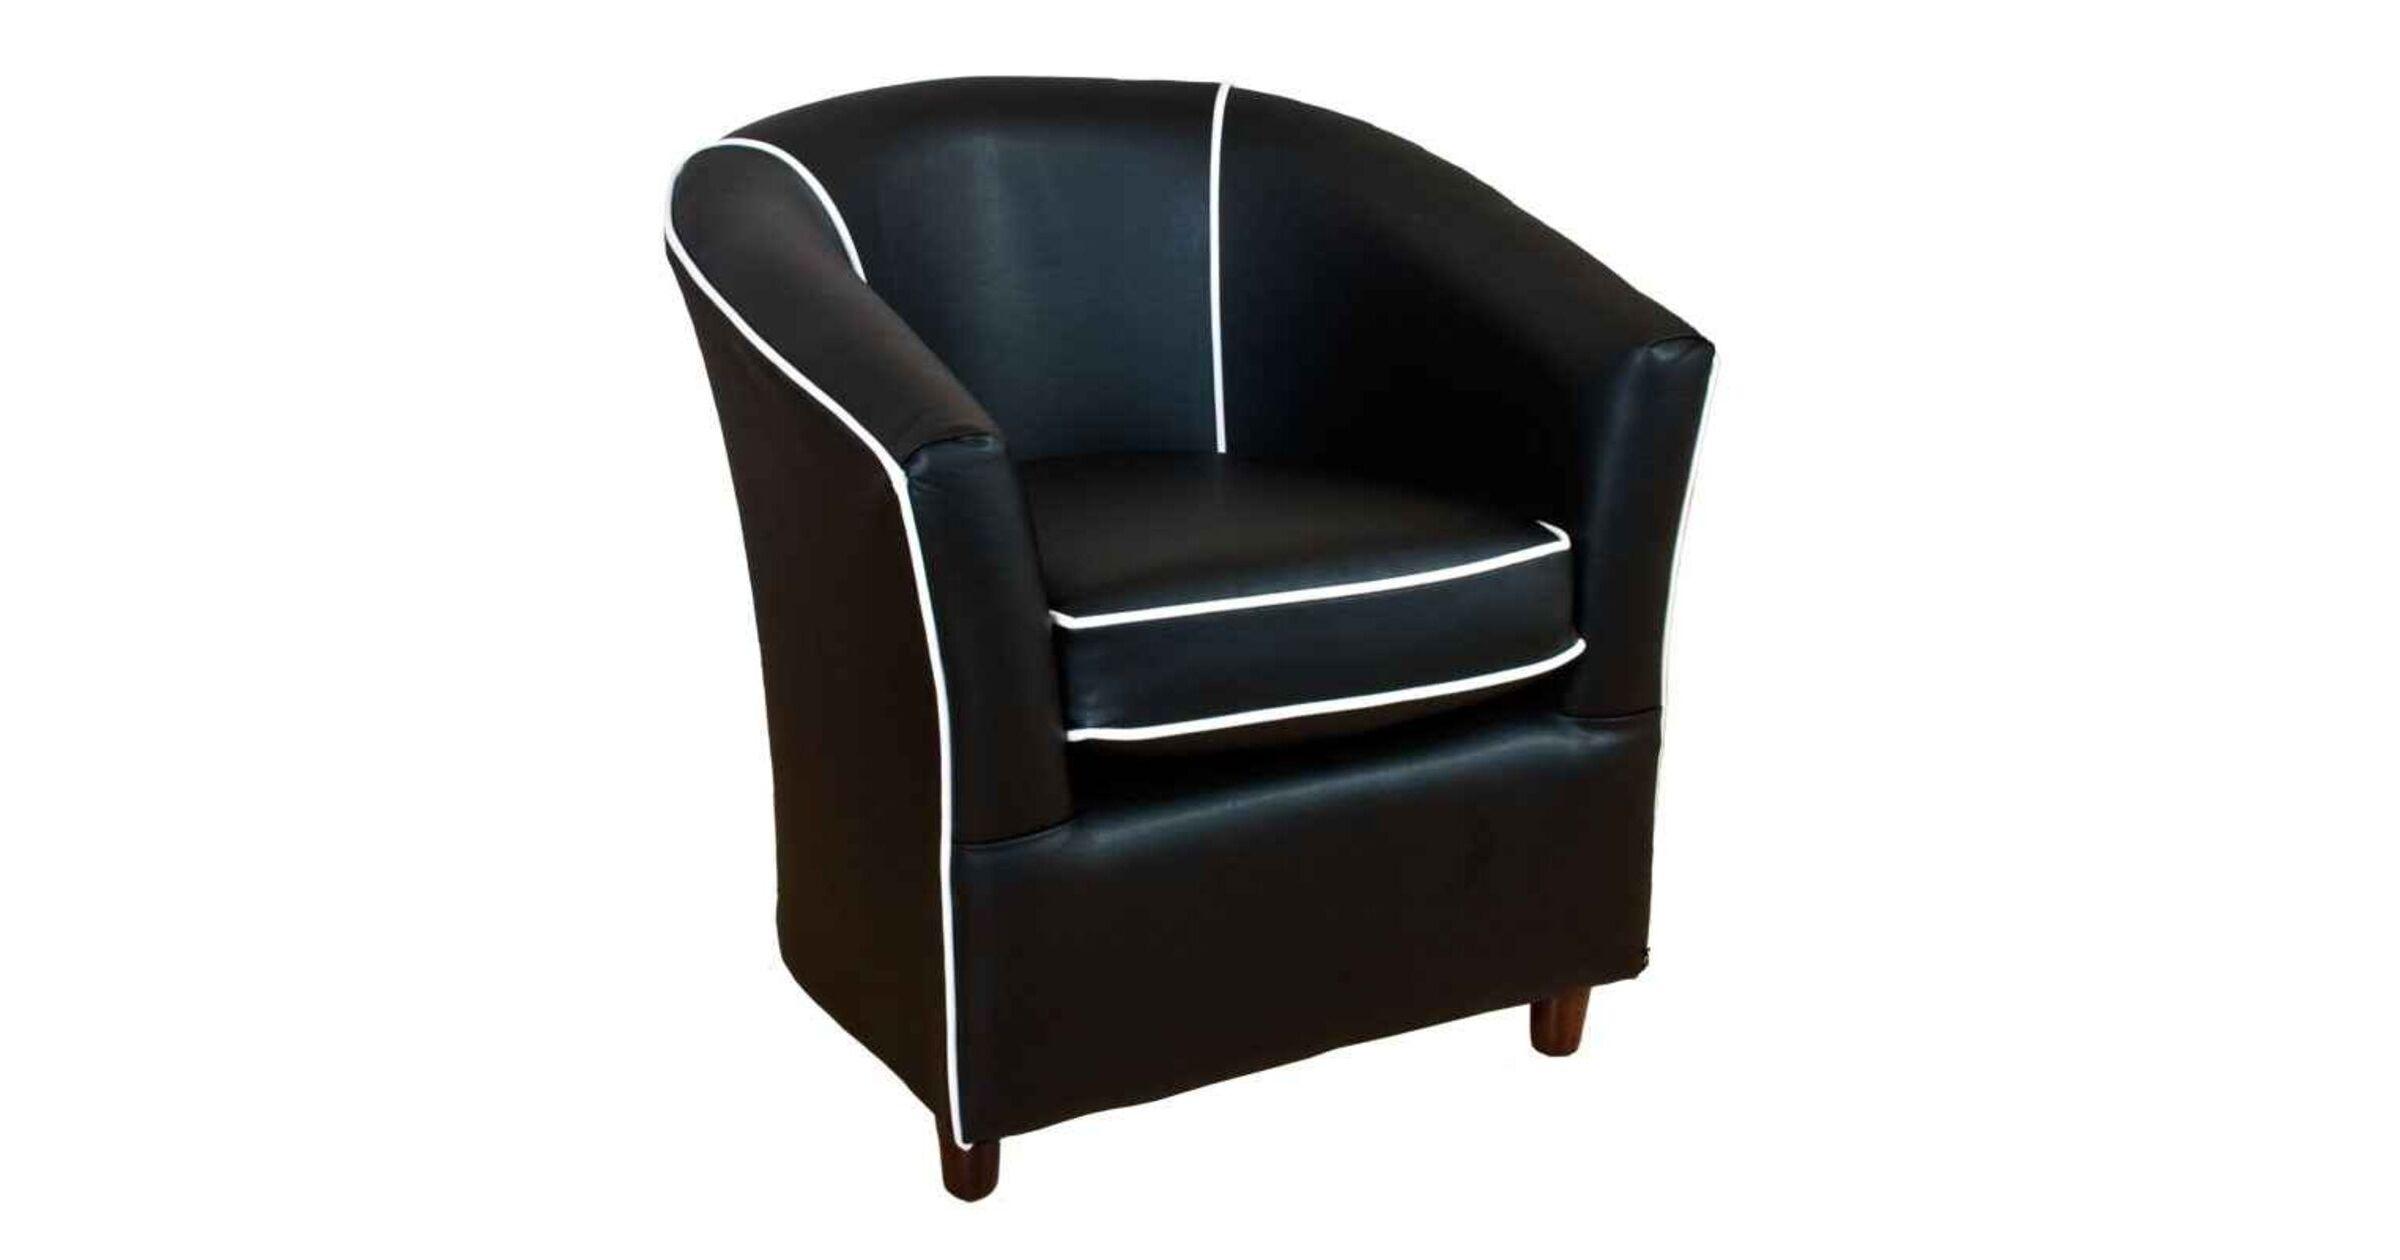 funky sofas for sale uk finn juhl poet sofa original leather tub bucket chair black with white trim